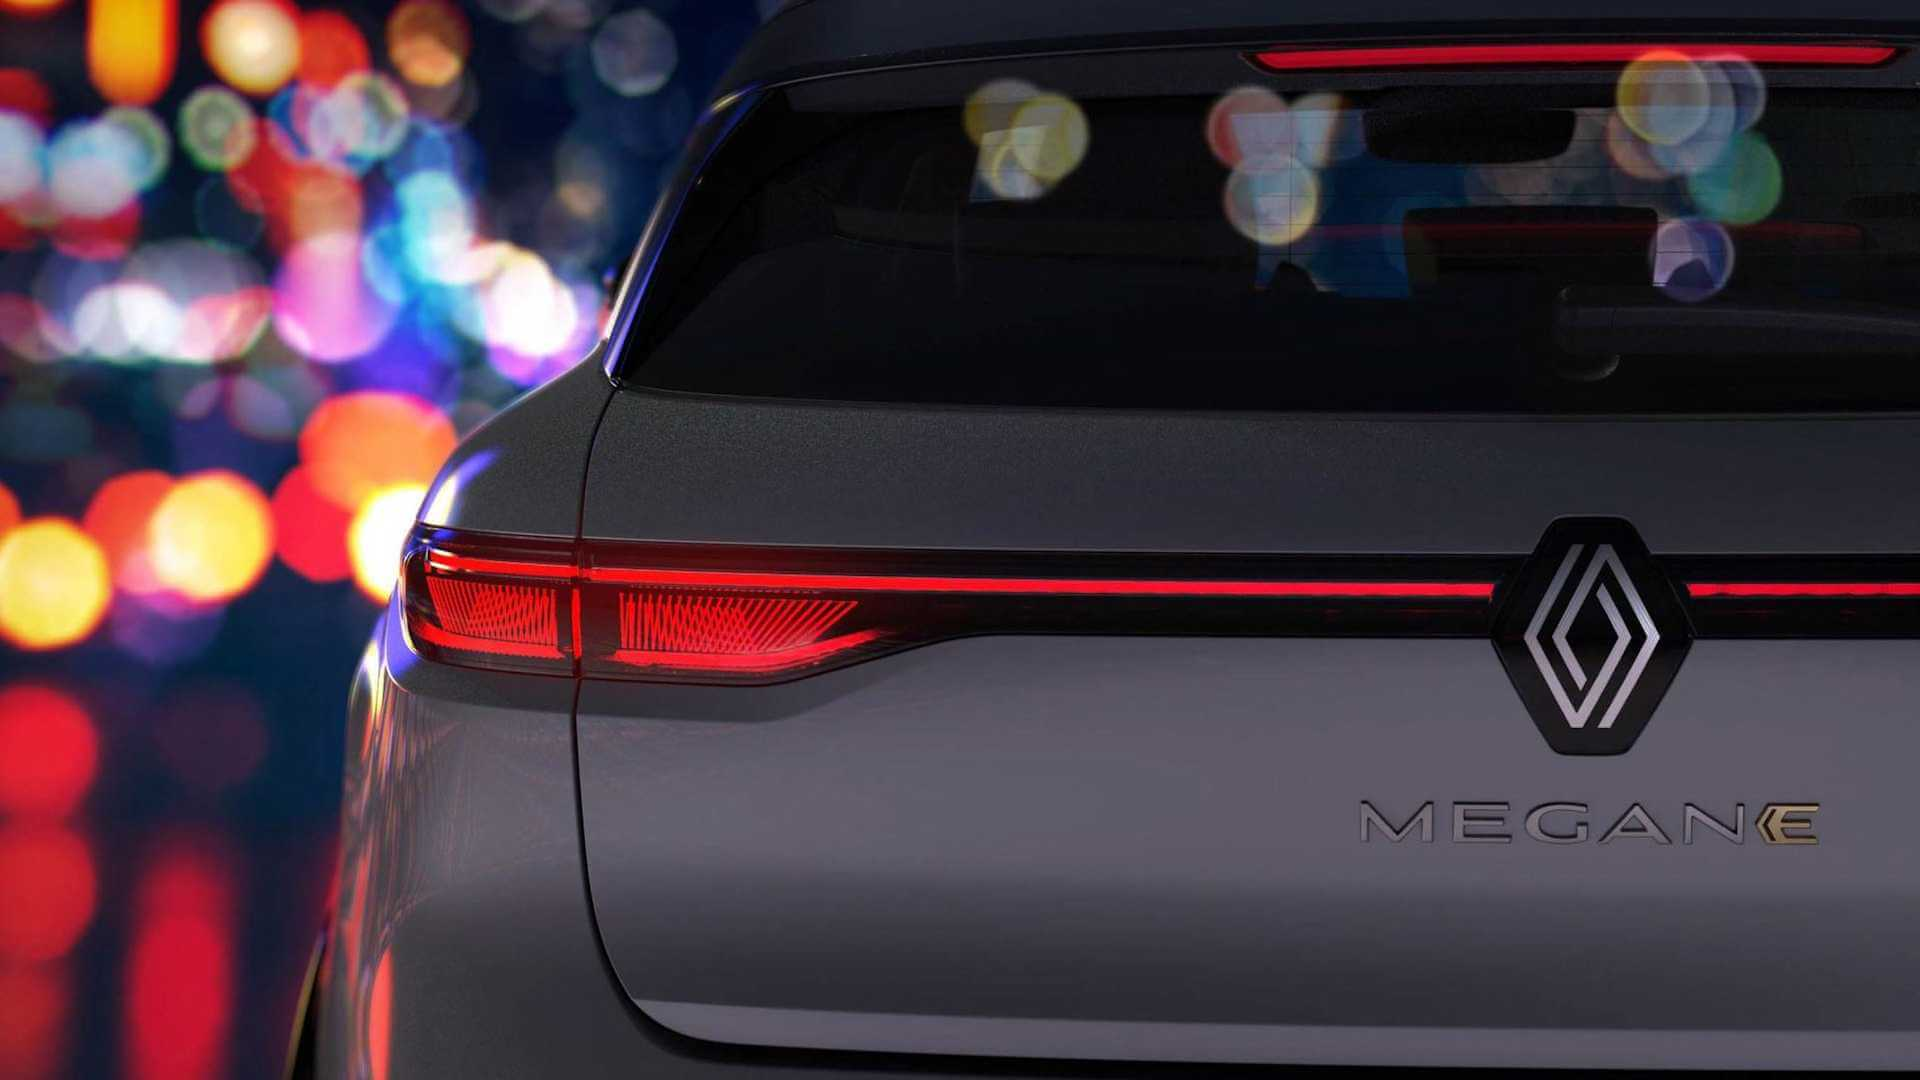 Renault показала екстер'єр та інтер'єр електричного Megane